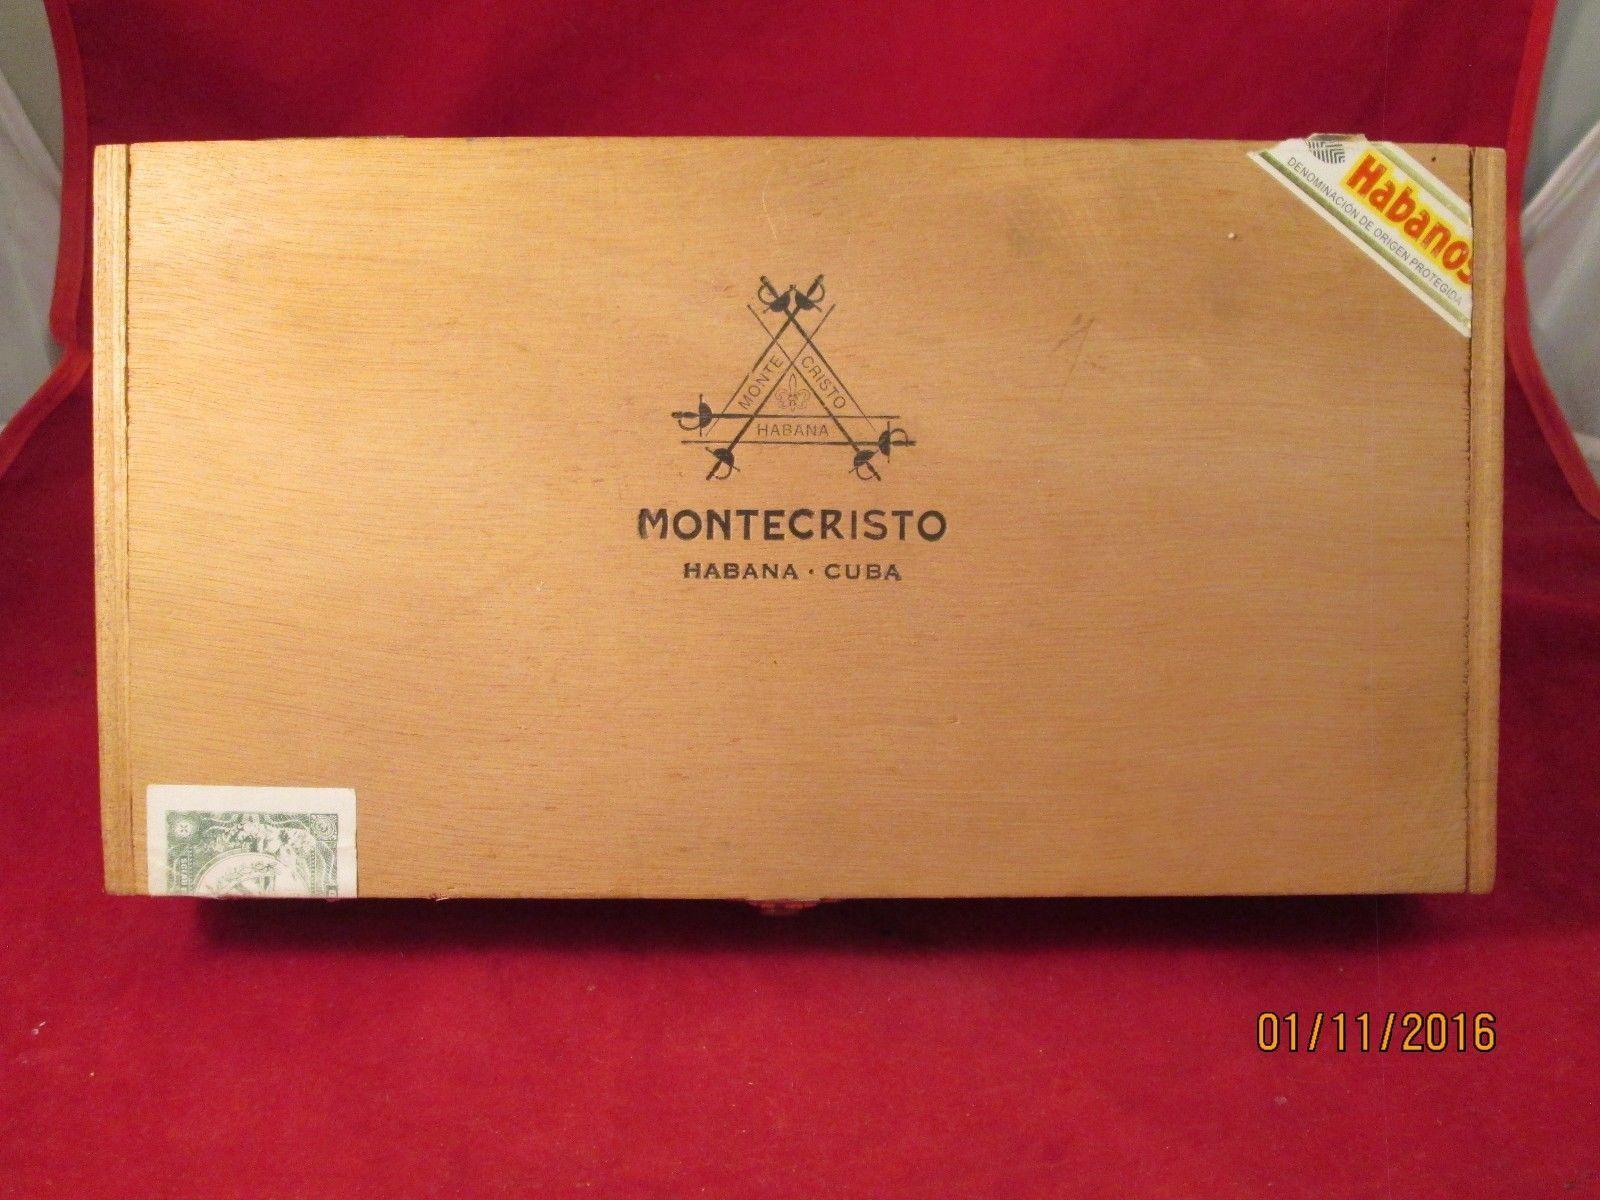 Montecristo Wood Cigar Box and 50 similar items. S l1600 4f554587c99c5